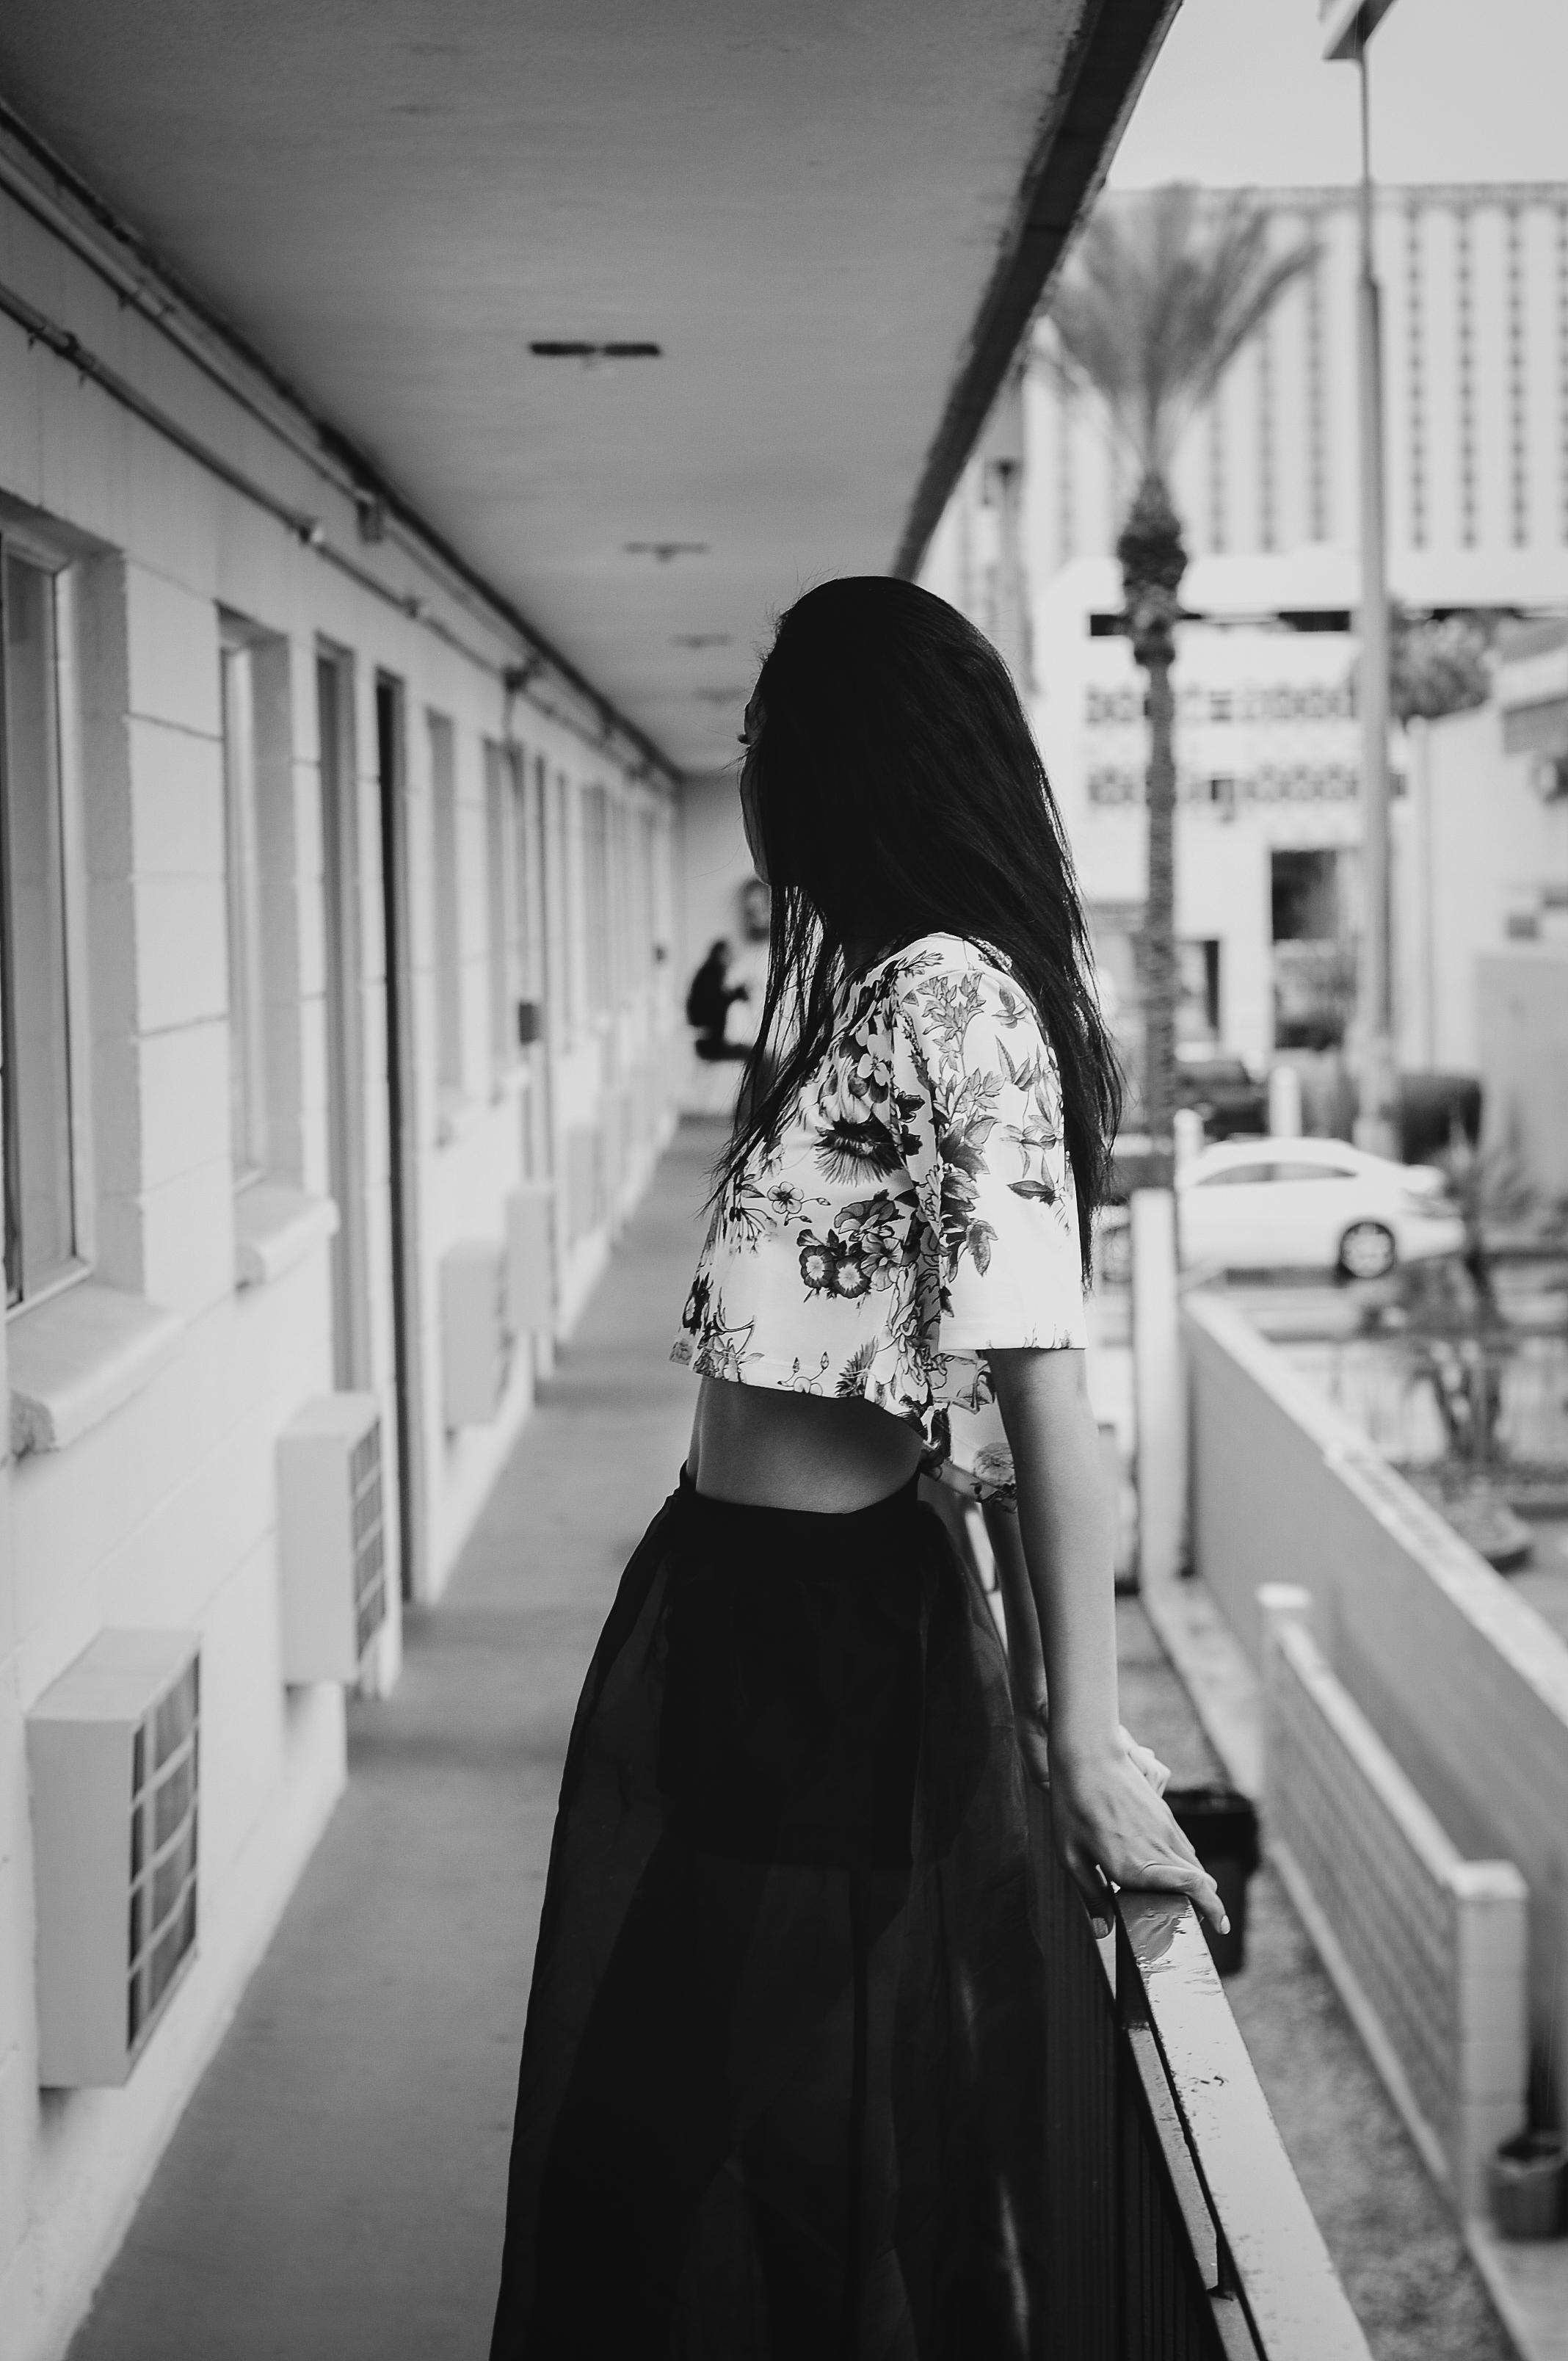 black and white, portrait, woman portrait, women black and white, ashley marie myers